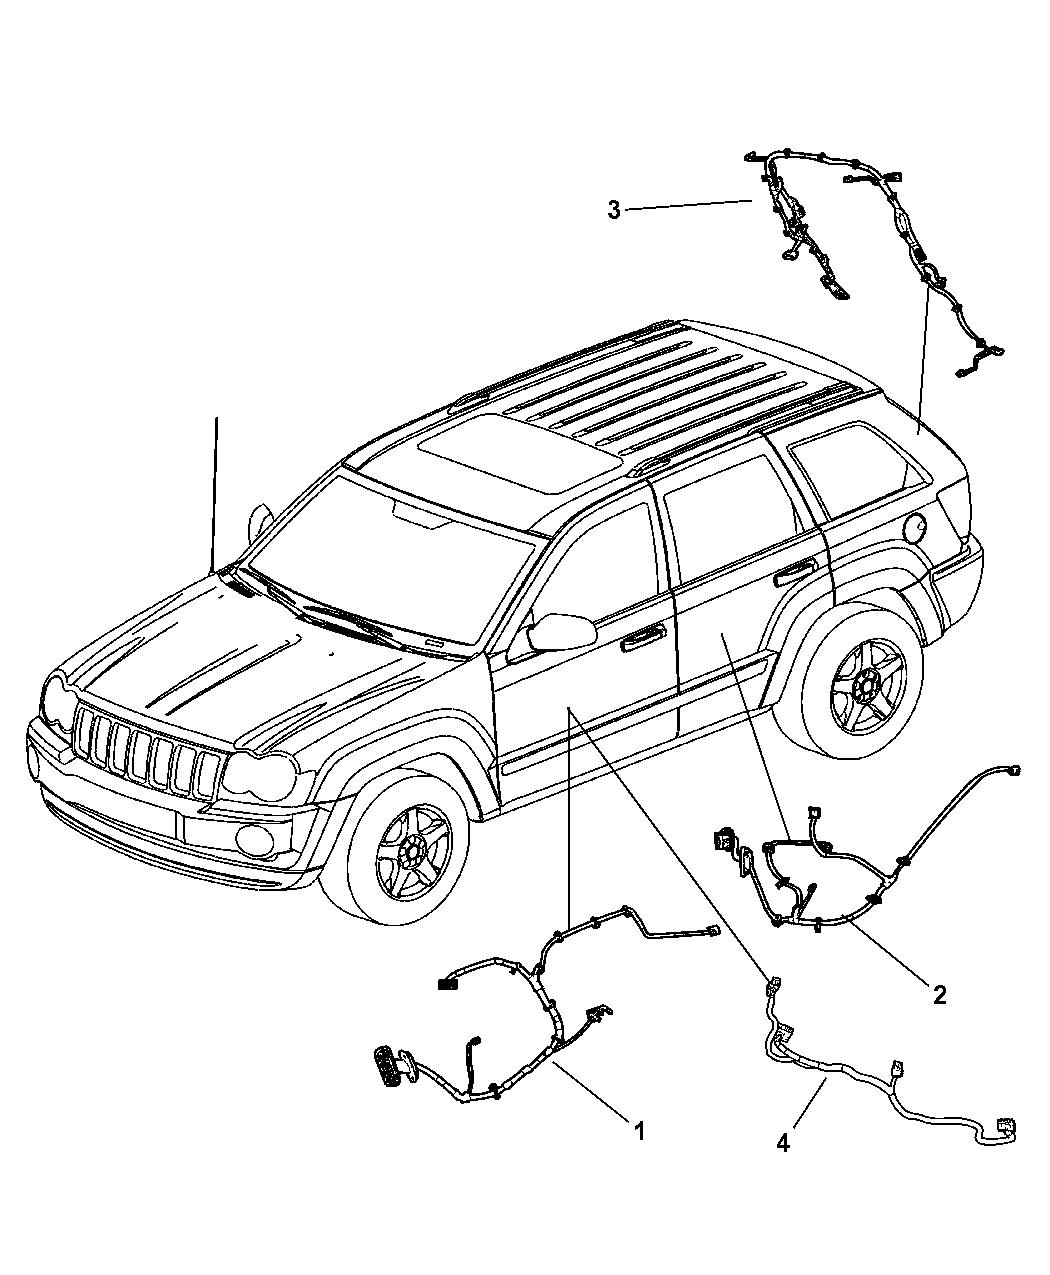 2006 Jeep Grand Cherokee Wiring